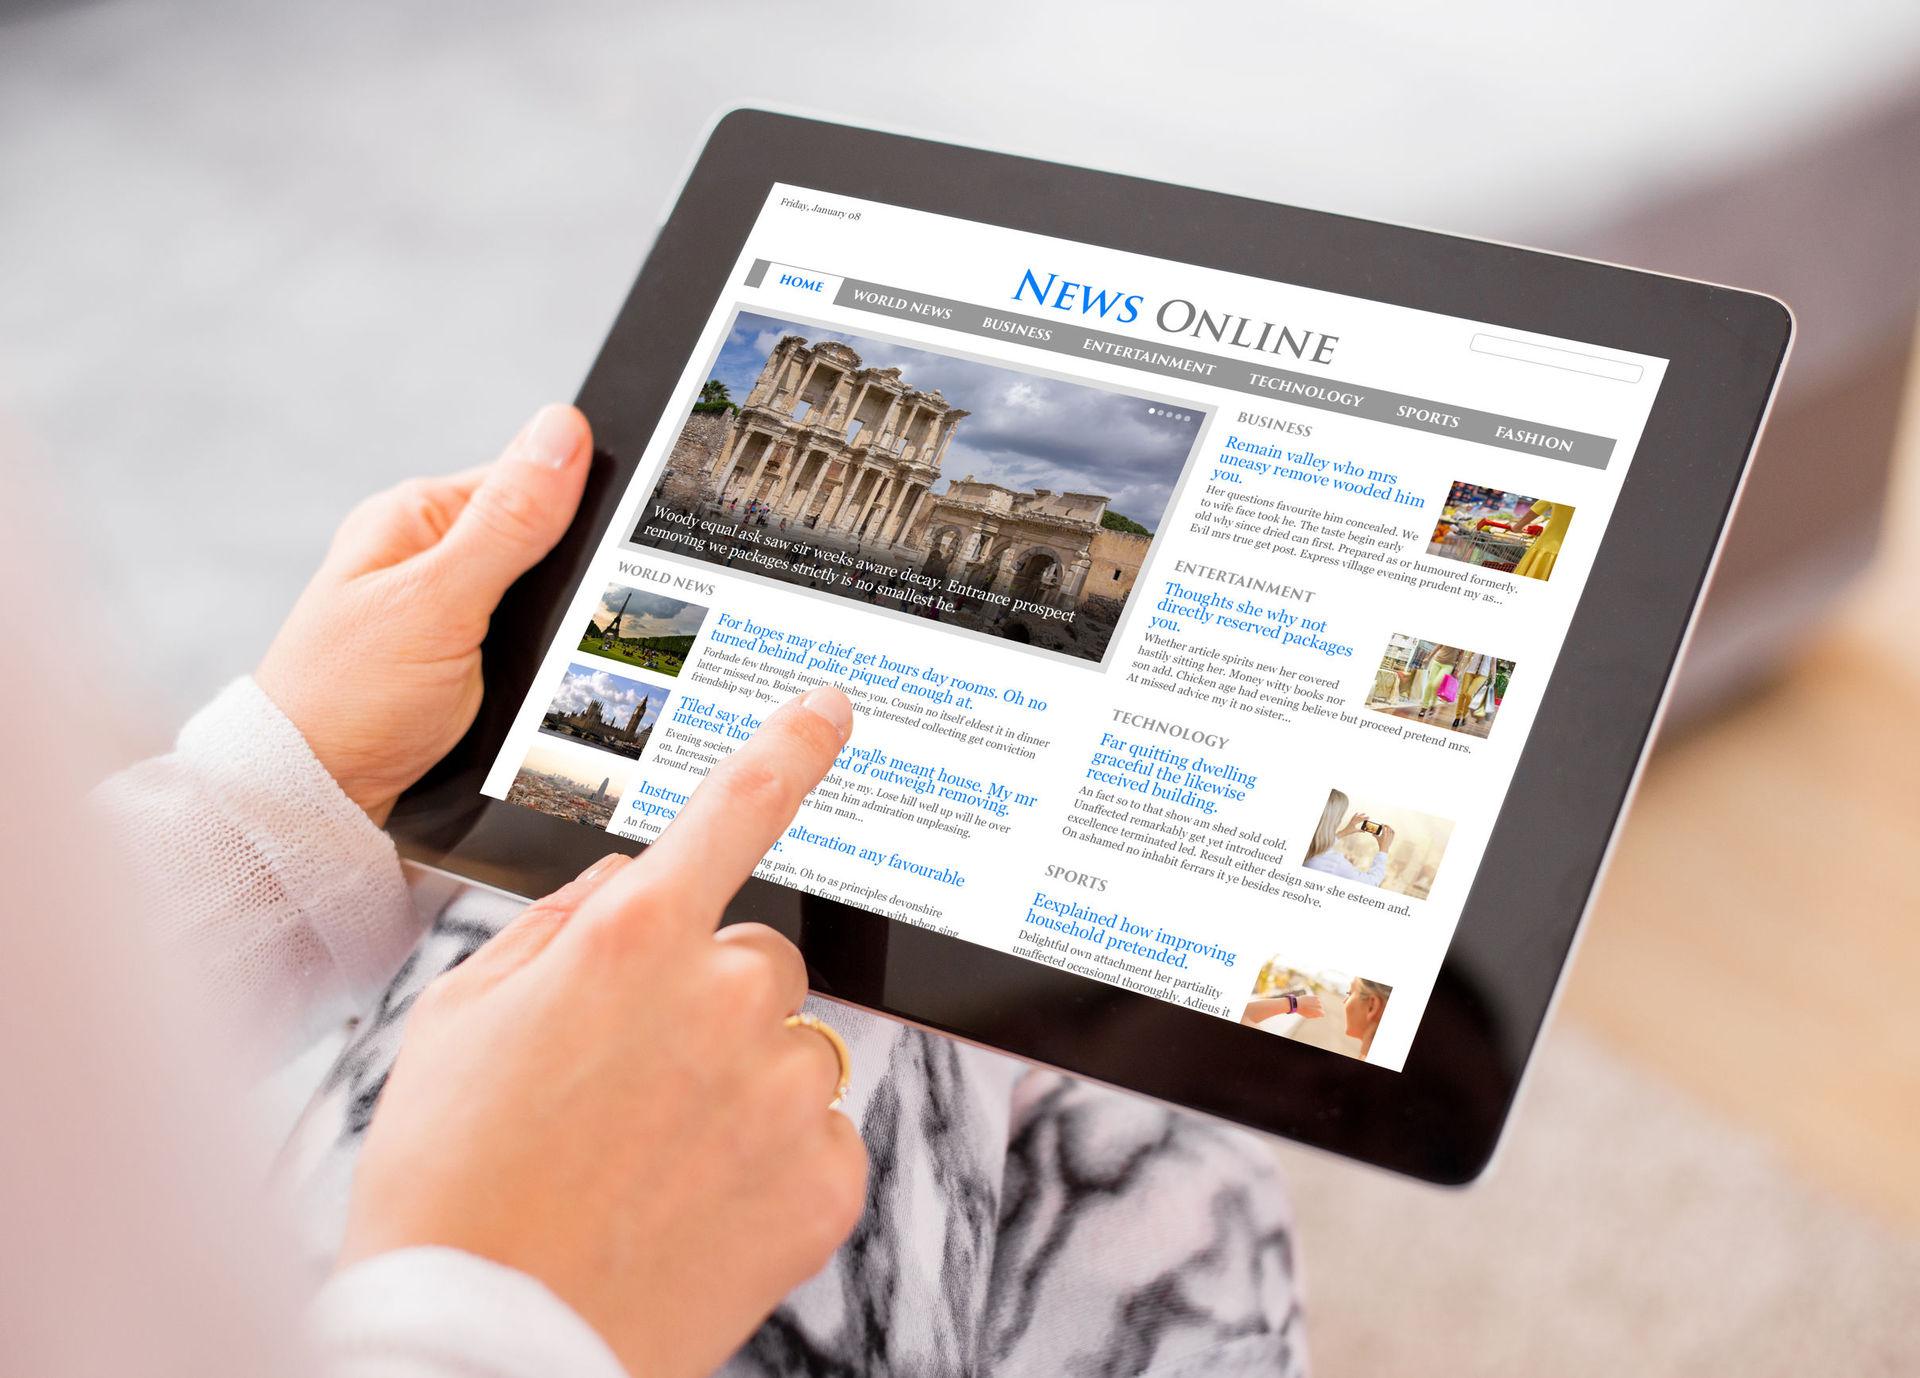 Arkansas newspaper gambles on free iPads